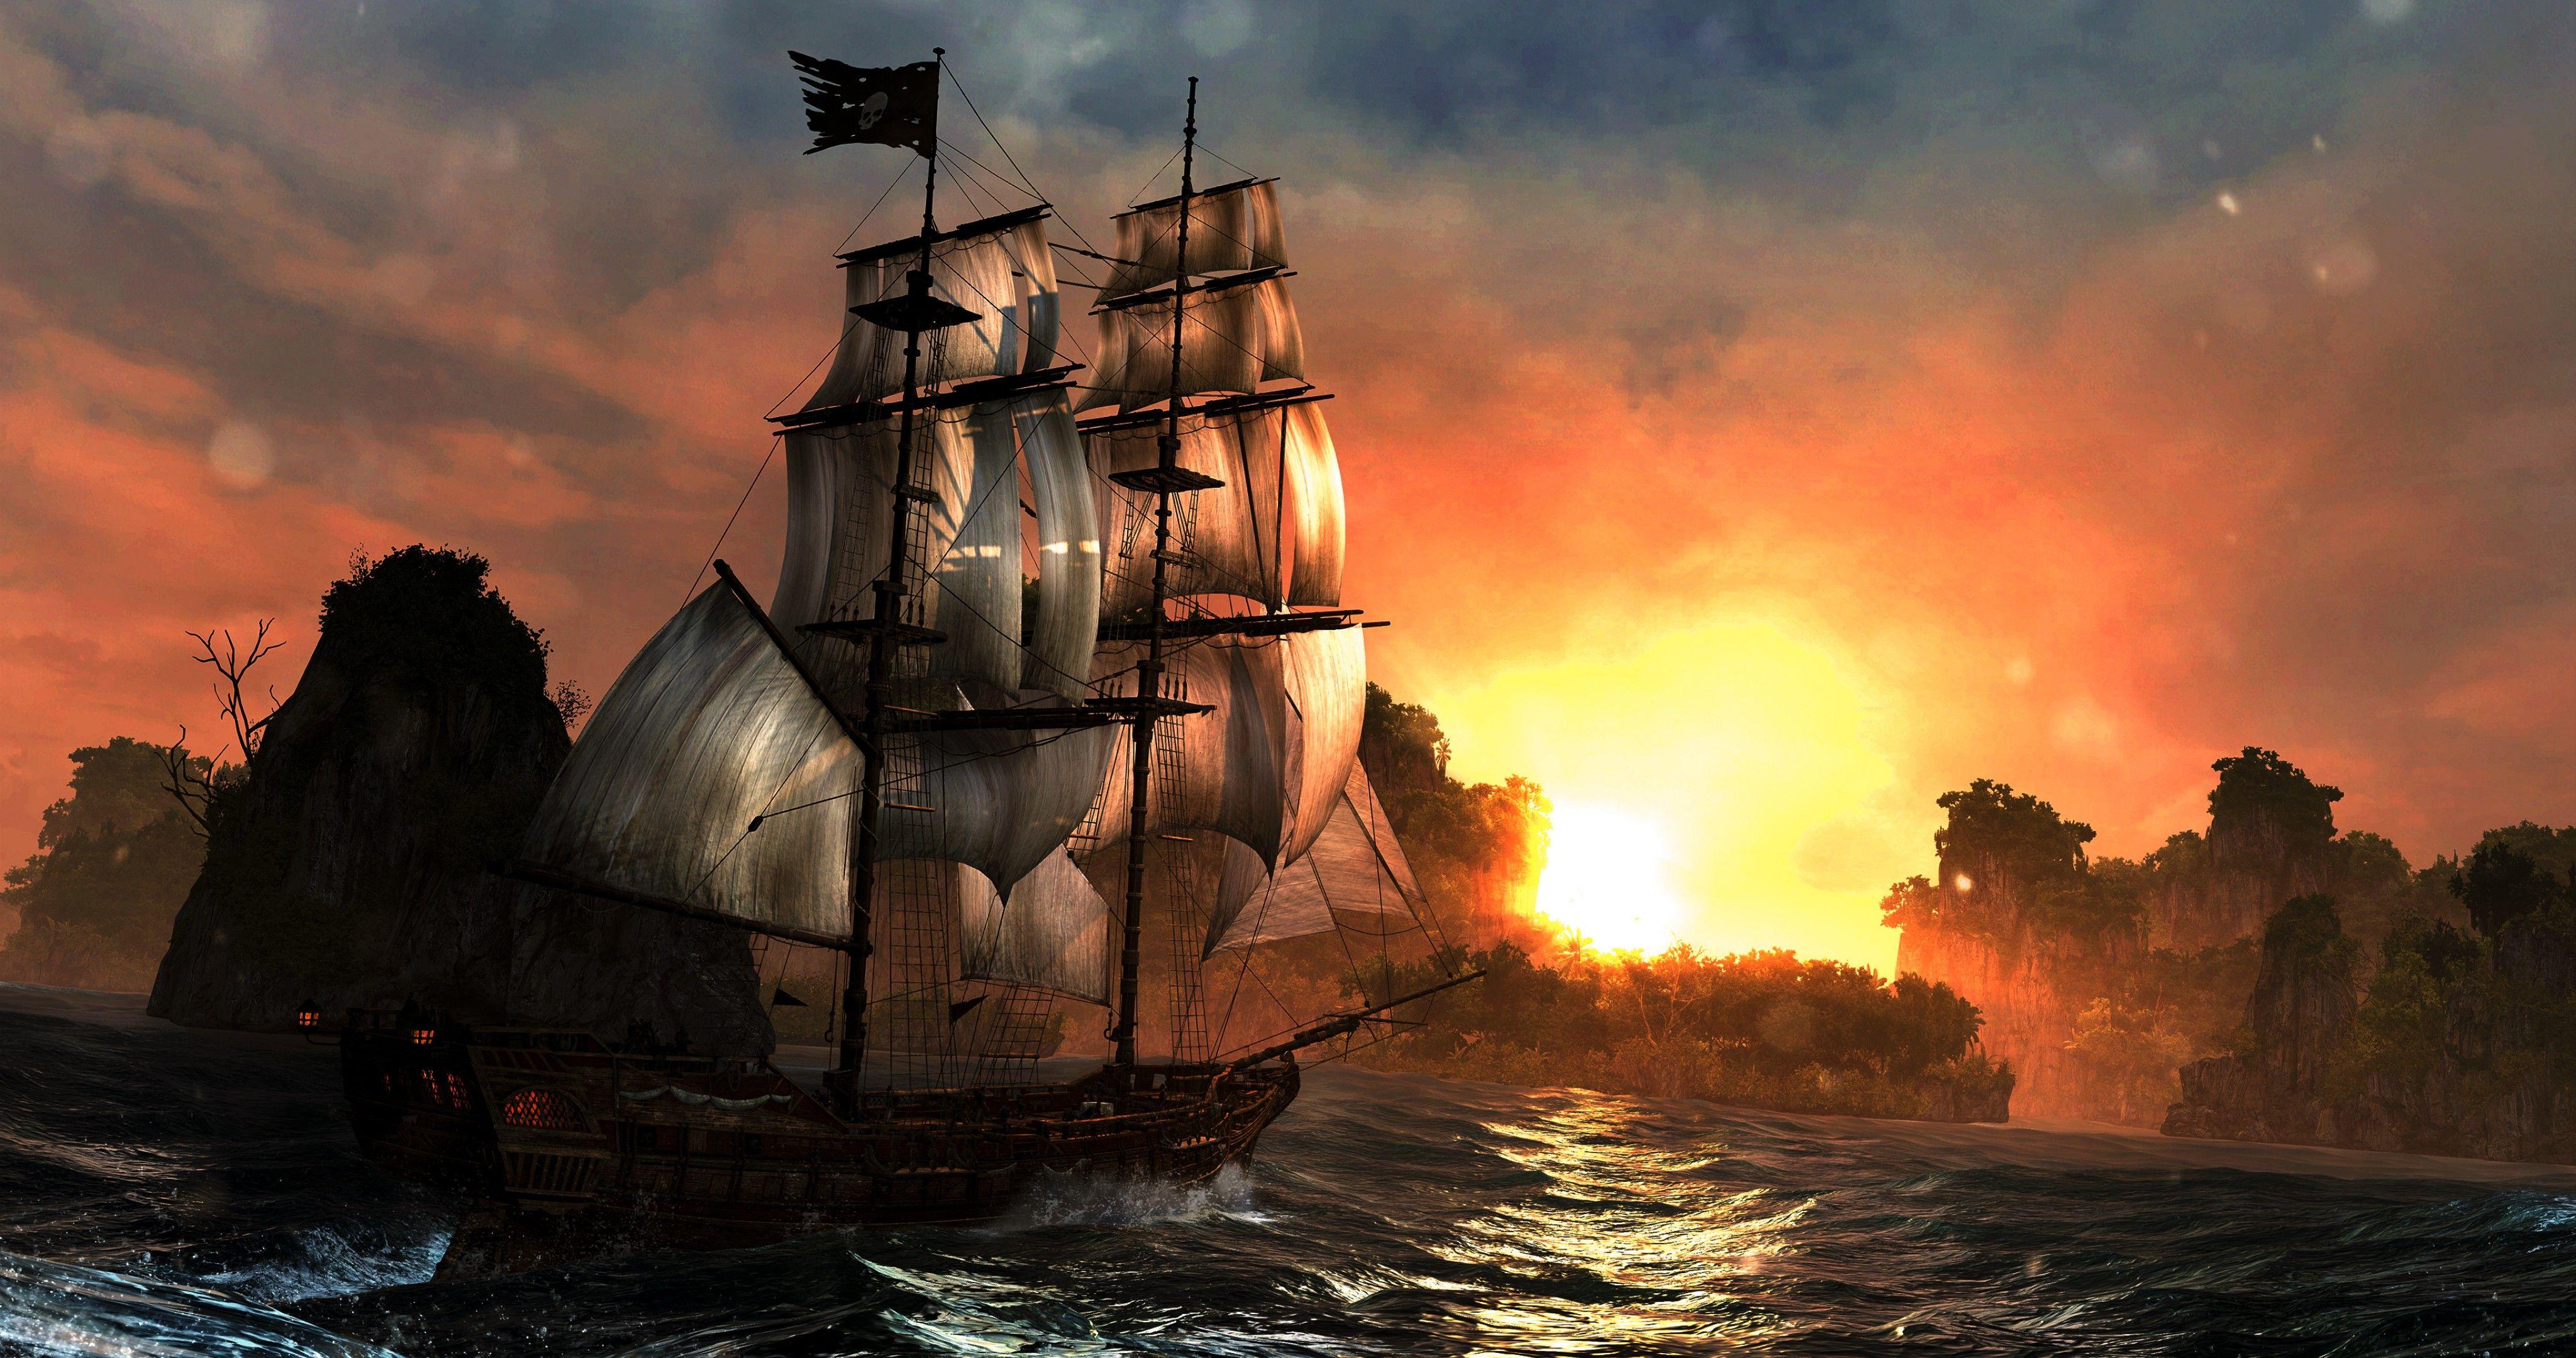 Fantasy ship cliff jolly roger pirate ship rock lightning wallpaper - Fantasy Ship Cliff Jolly Roger Pirate Ship Rock Lightning Wallpaper 58